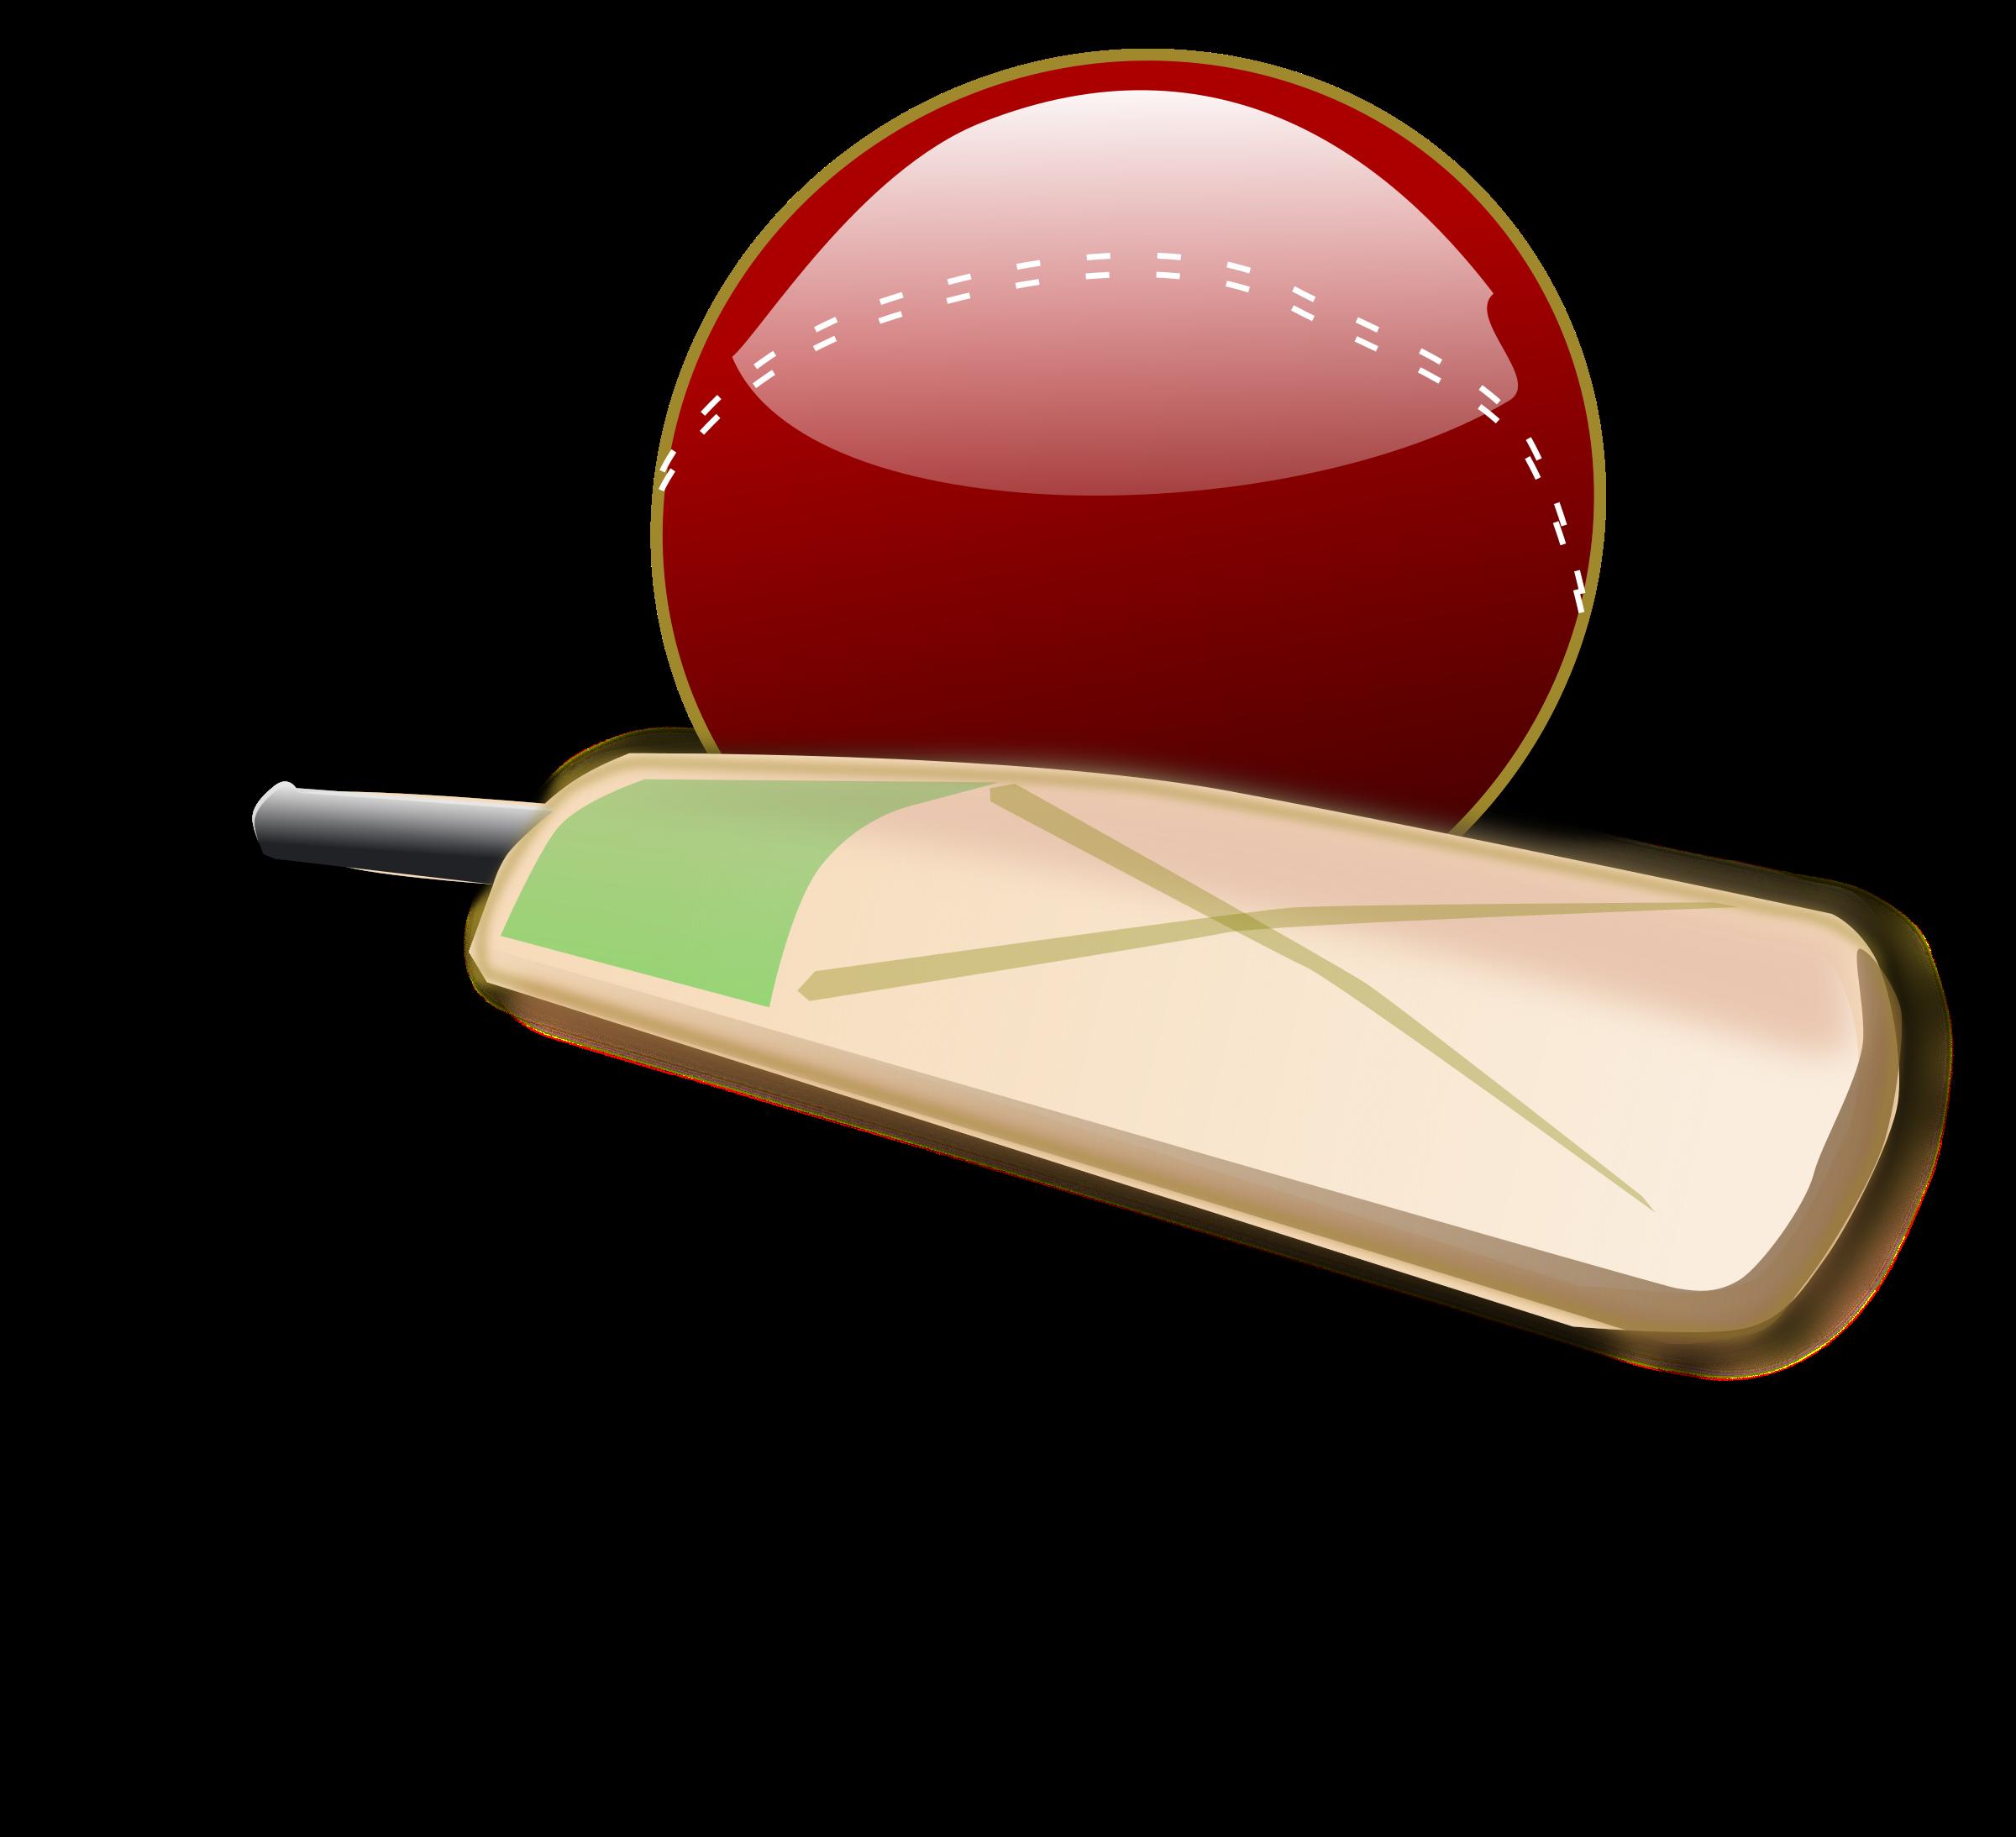 cricket 03 by inky2010 clipart pinterest cricket and clip art rh pinterest com